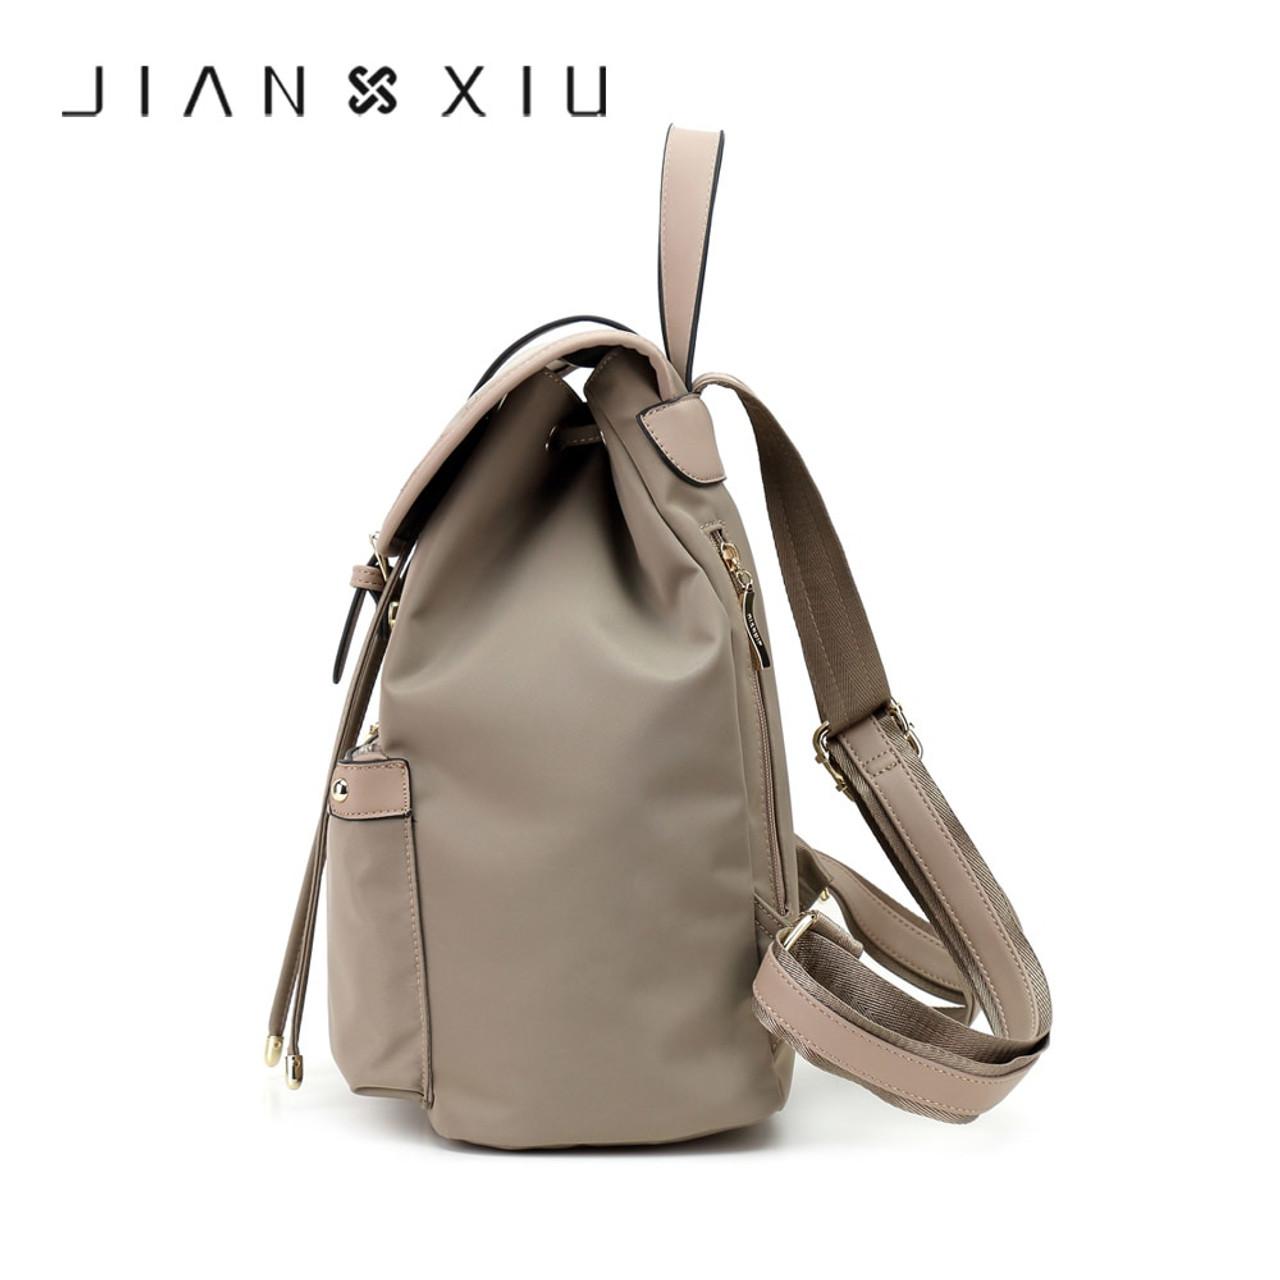 dad5644ec ... JIANXIU Fashion Backpack Women Bag Mochilas School Bags Oxford Backpacks  Travel Mochilas Mujer Ultra-light ...